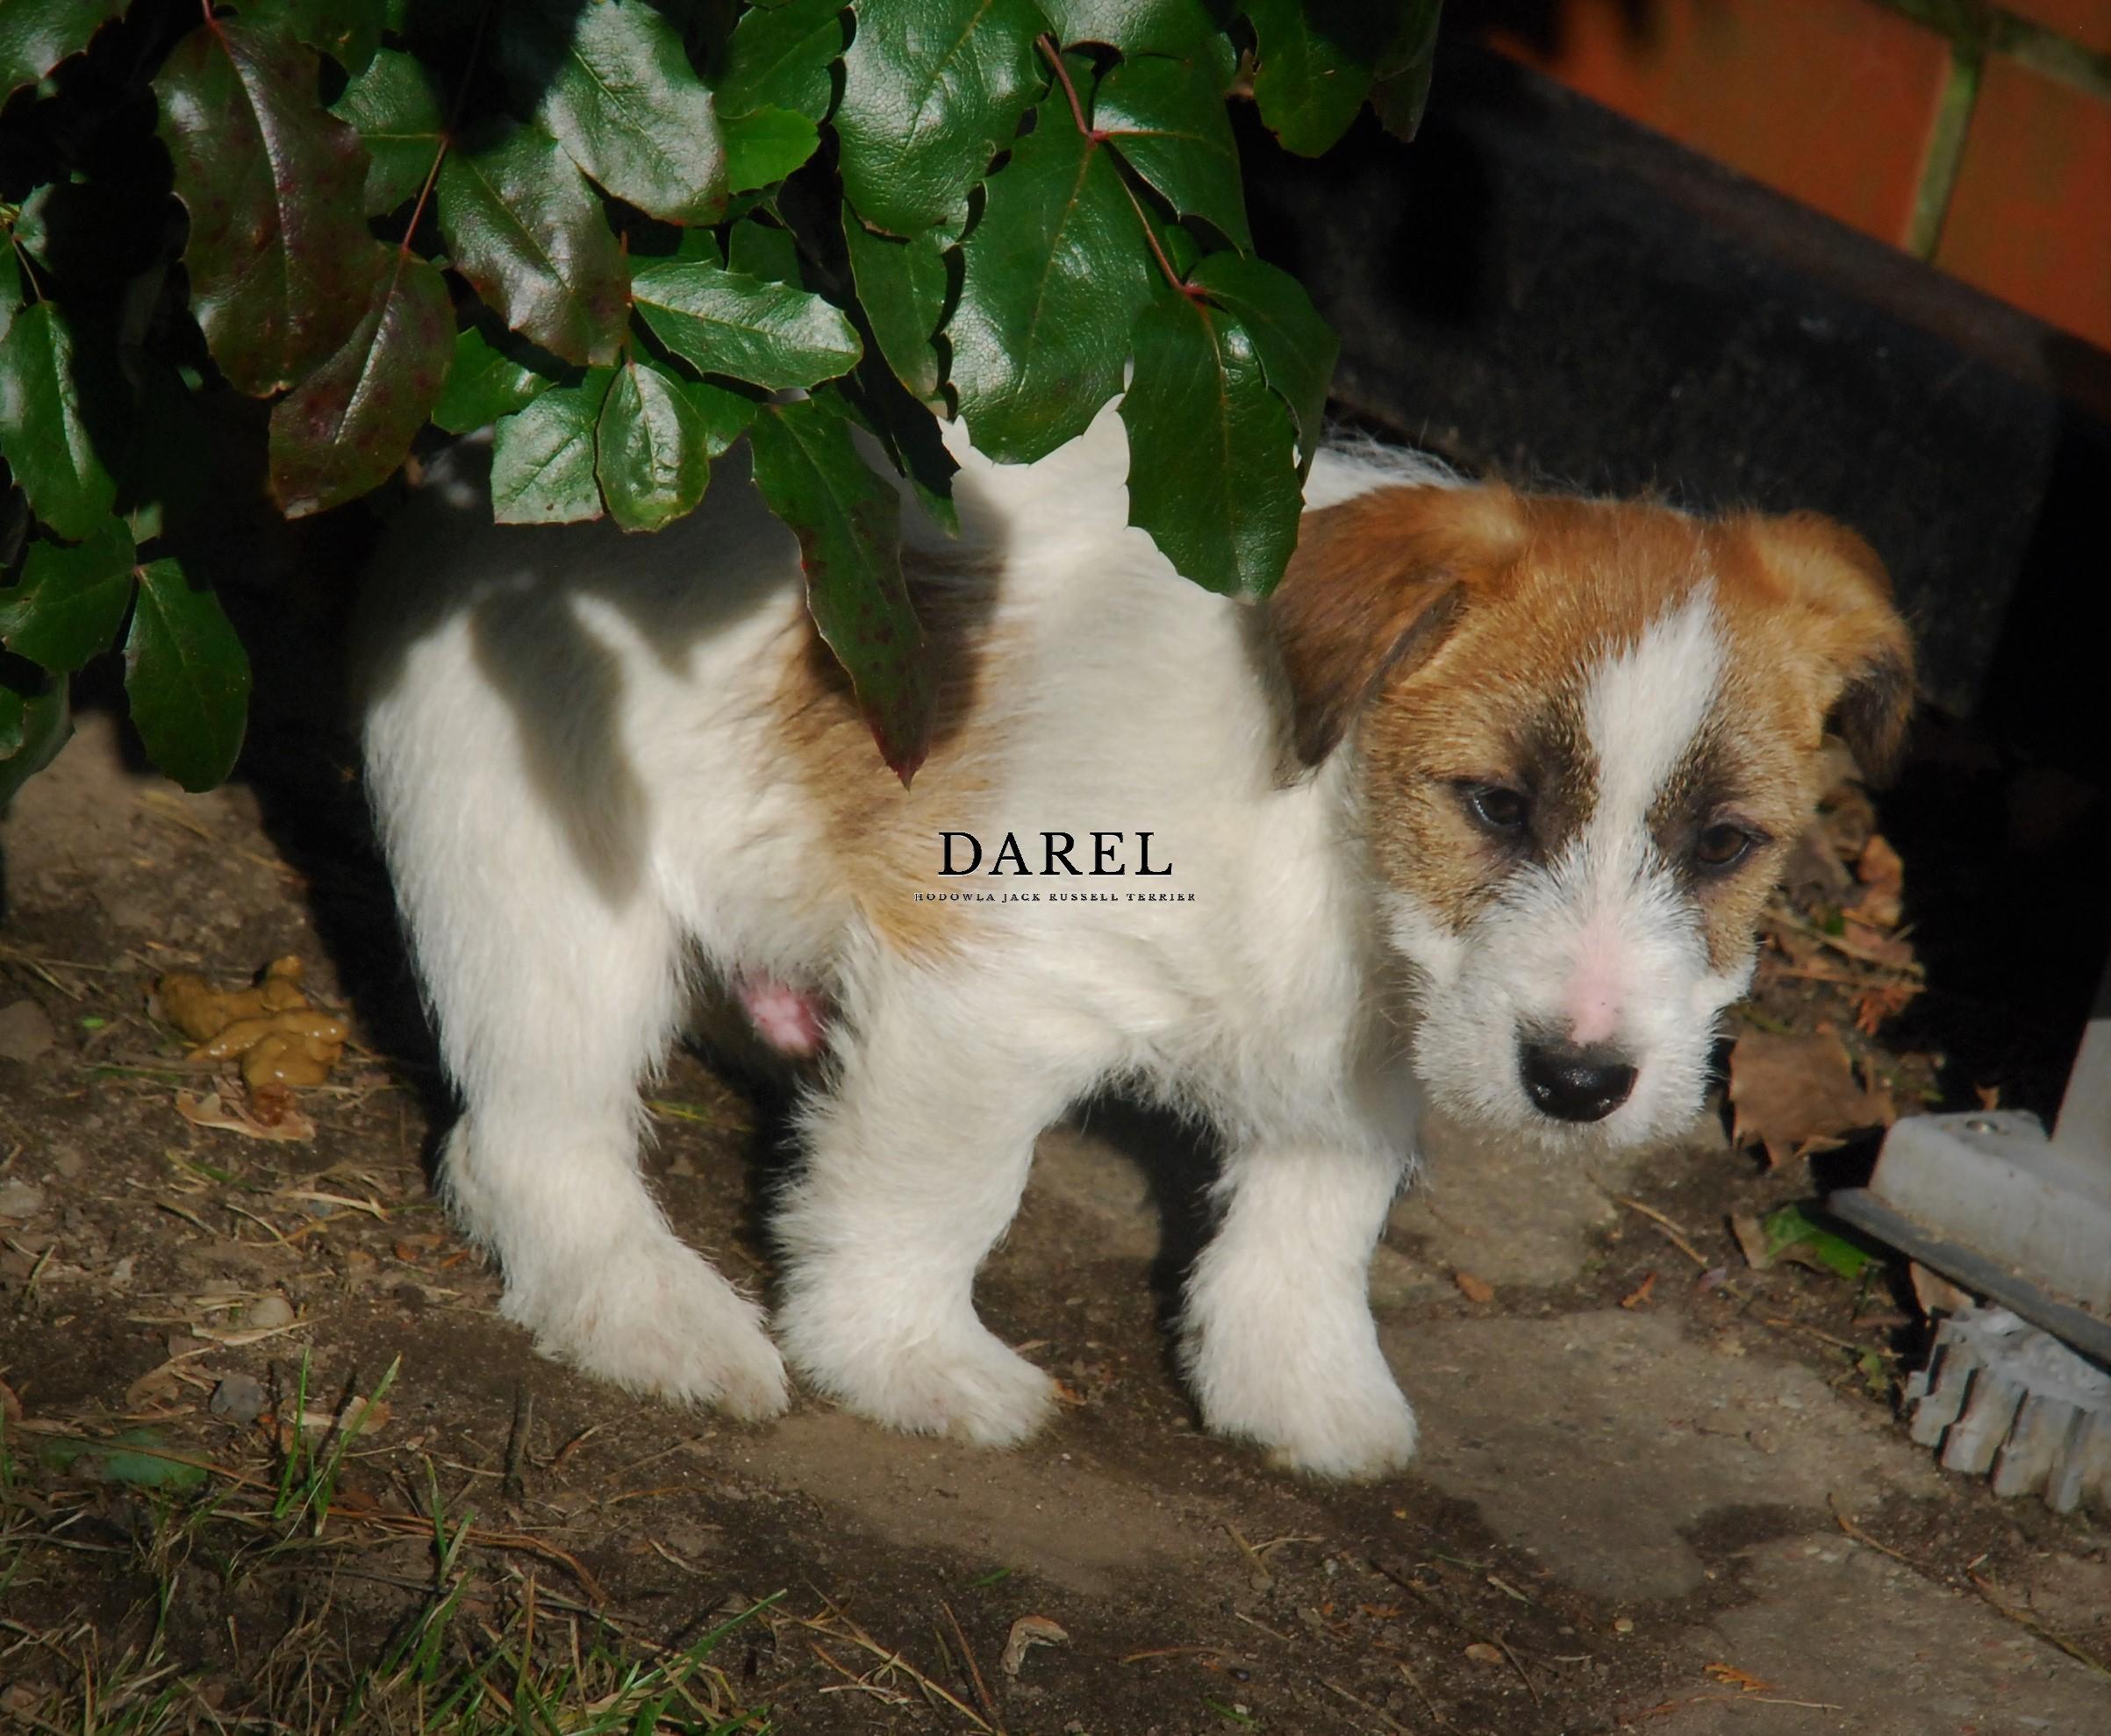 DAKAR | DAREL Hodowla jack russell terrier JRT